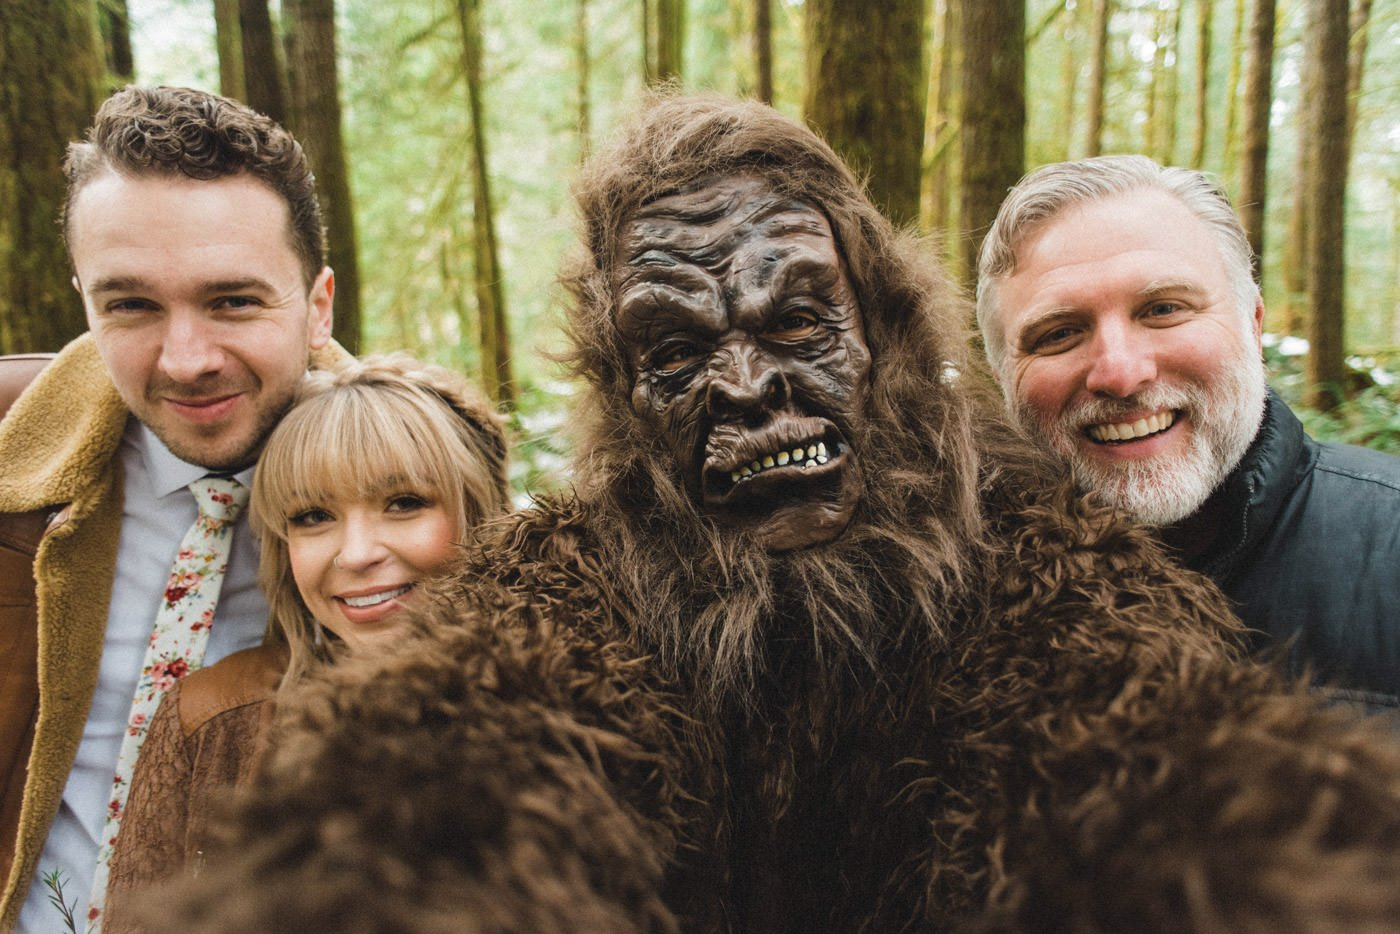 Portland Bigfoot Wedding officiated by Cliff Barackman